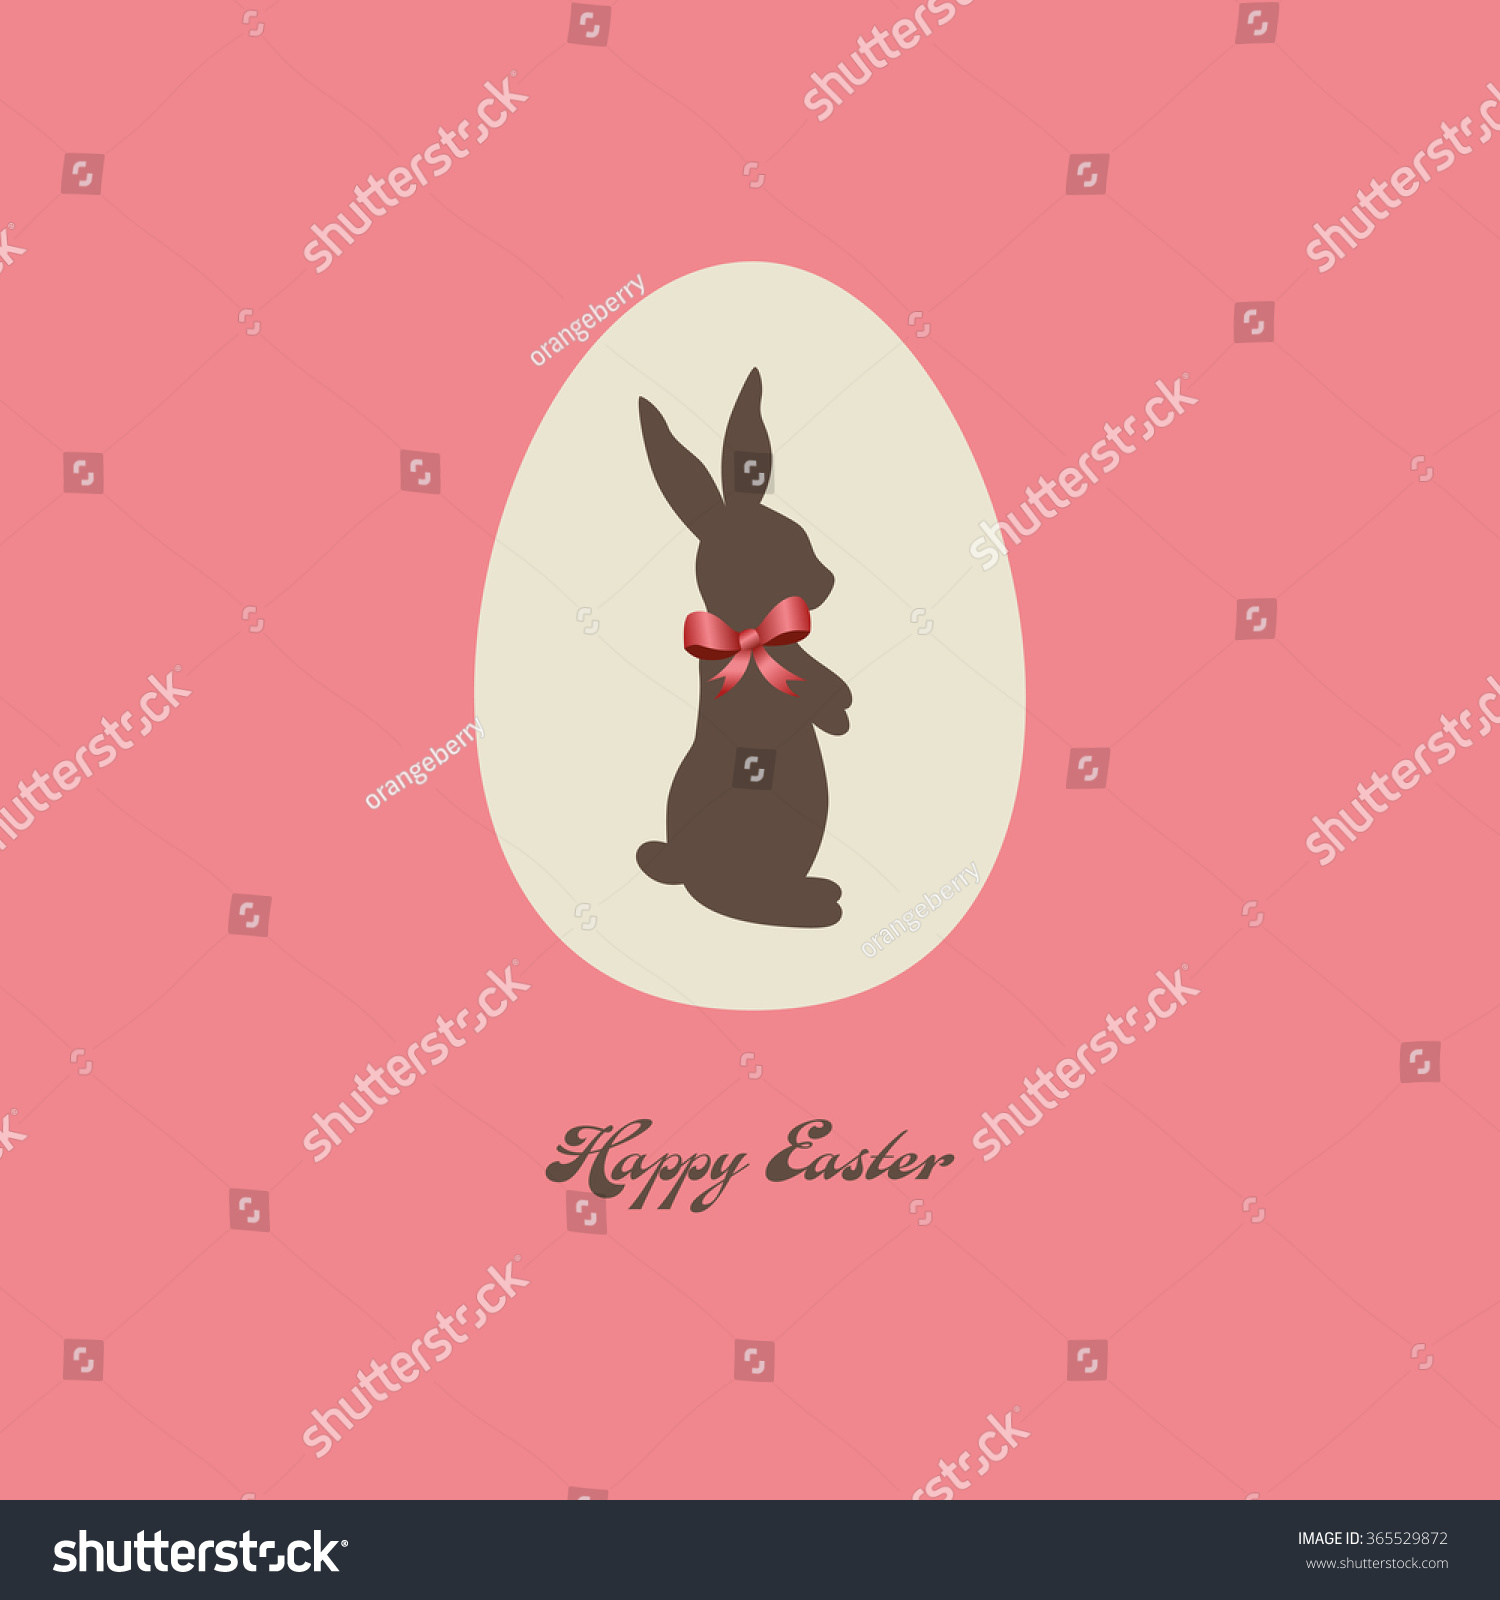 Happy Easter Card Stock Vector 365529872 - Shutterstock